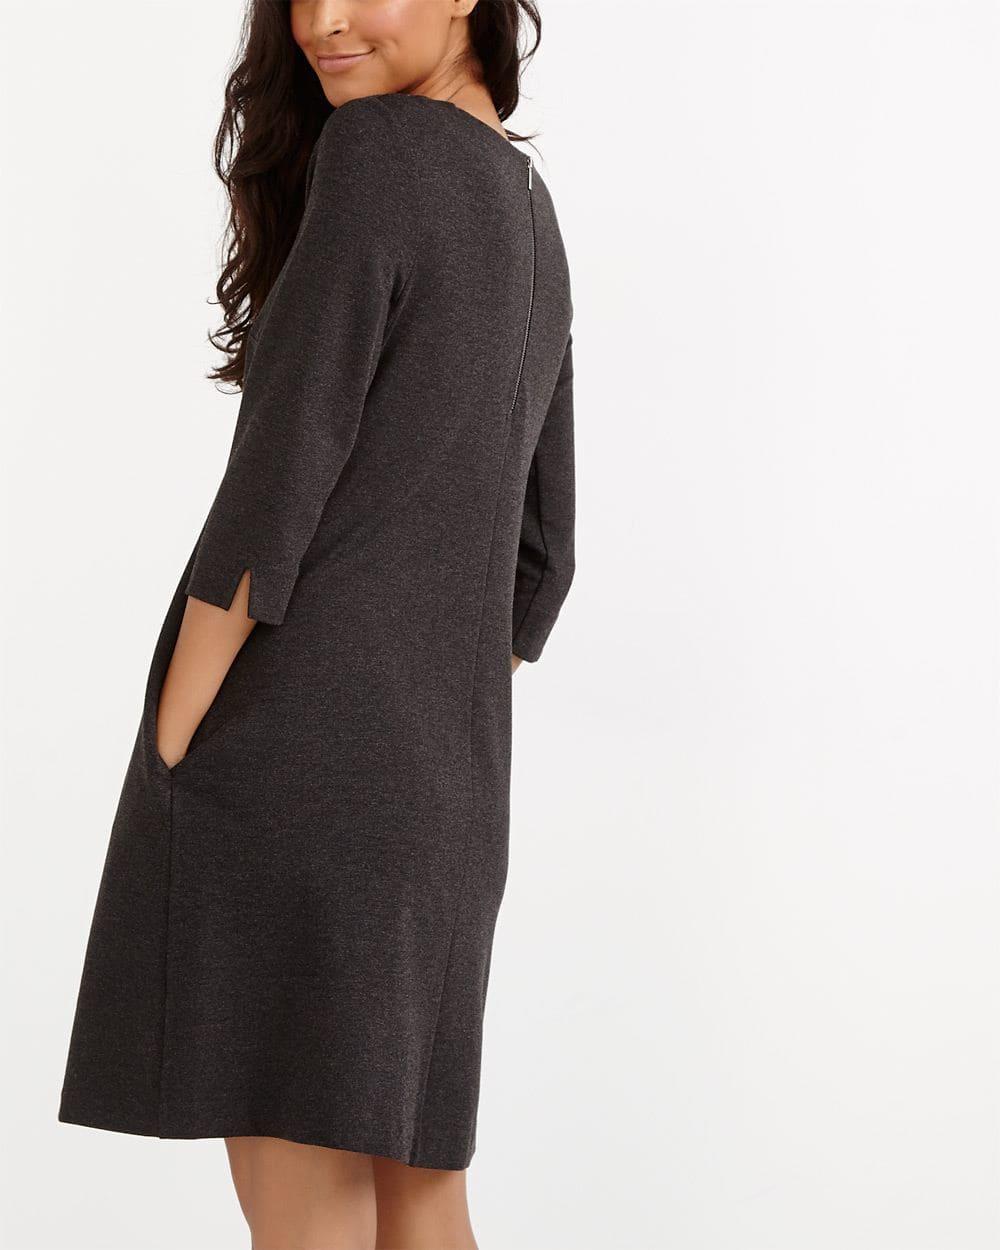 Pocket Dress